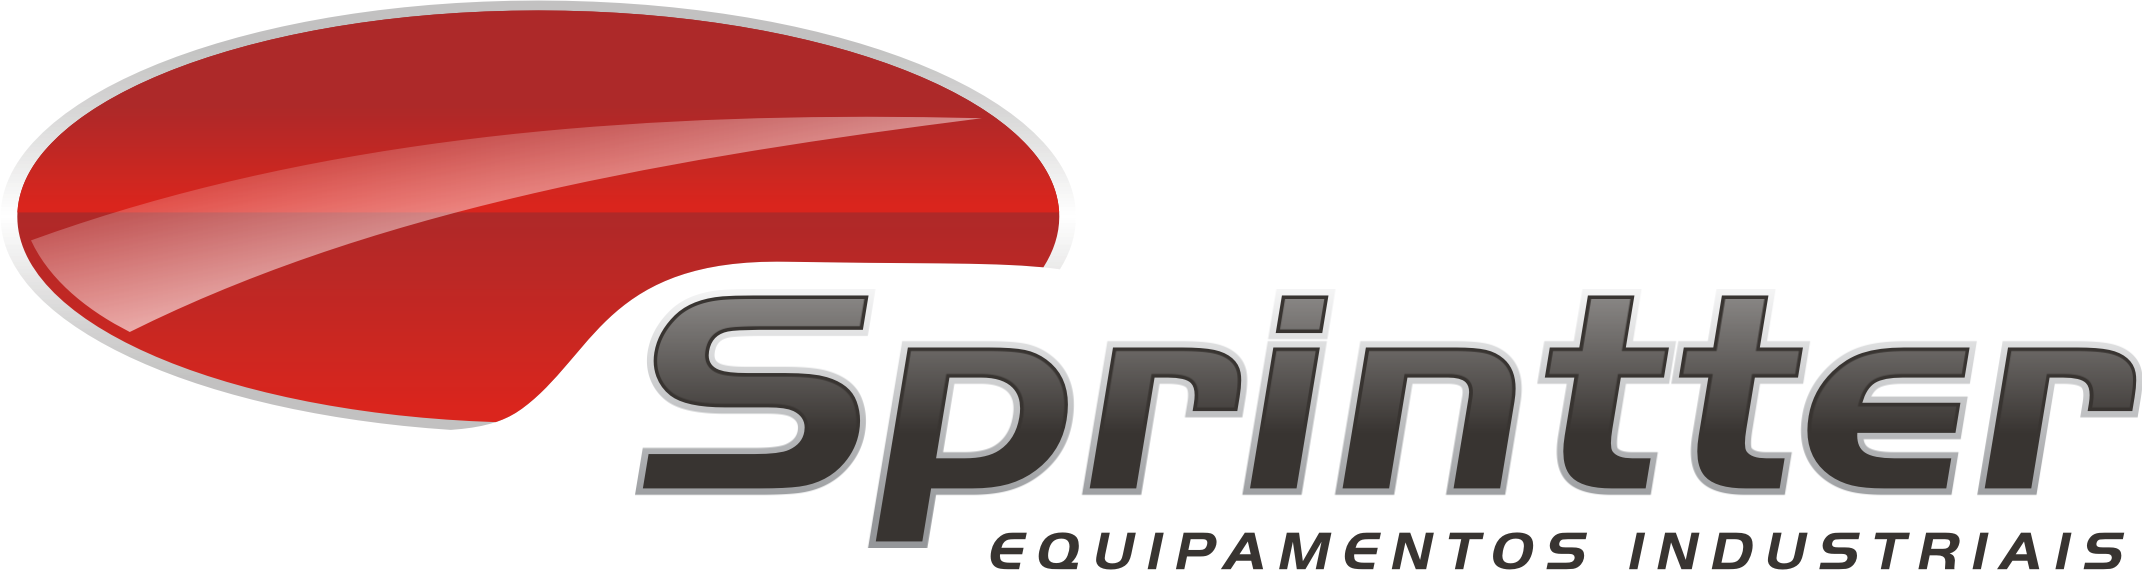 Sprintter